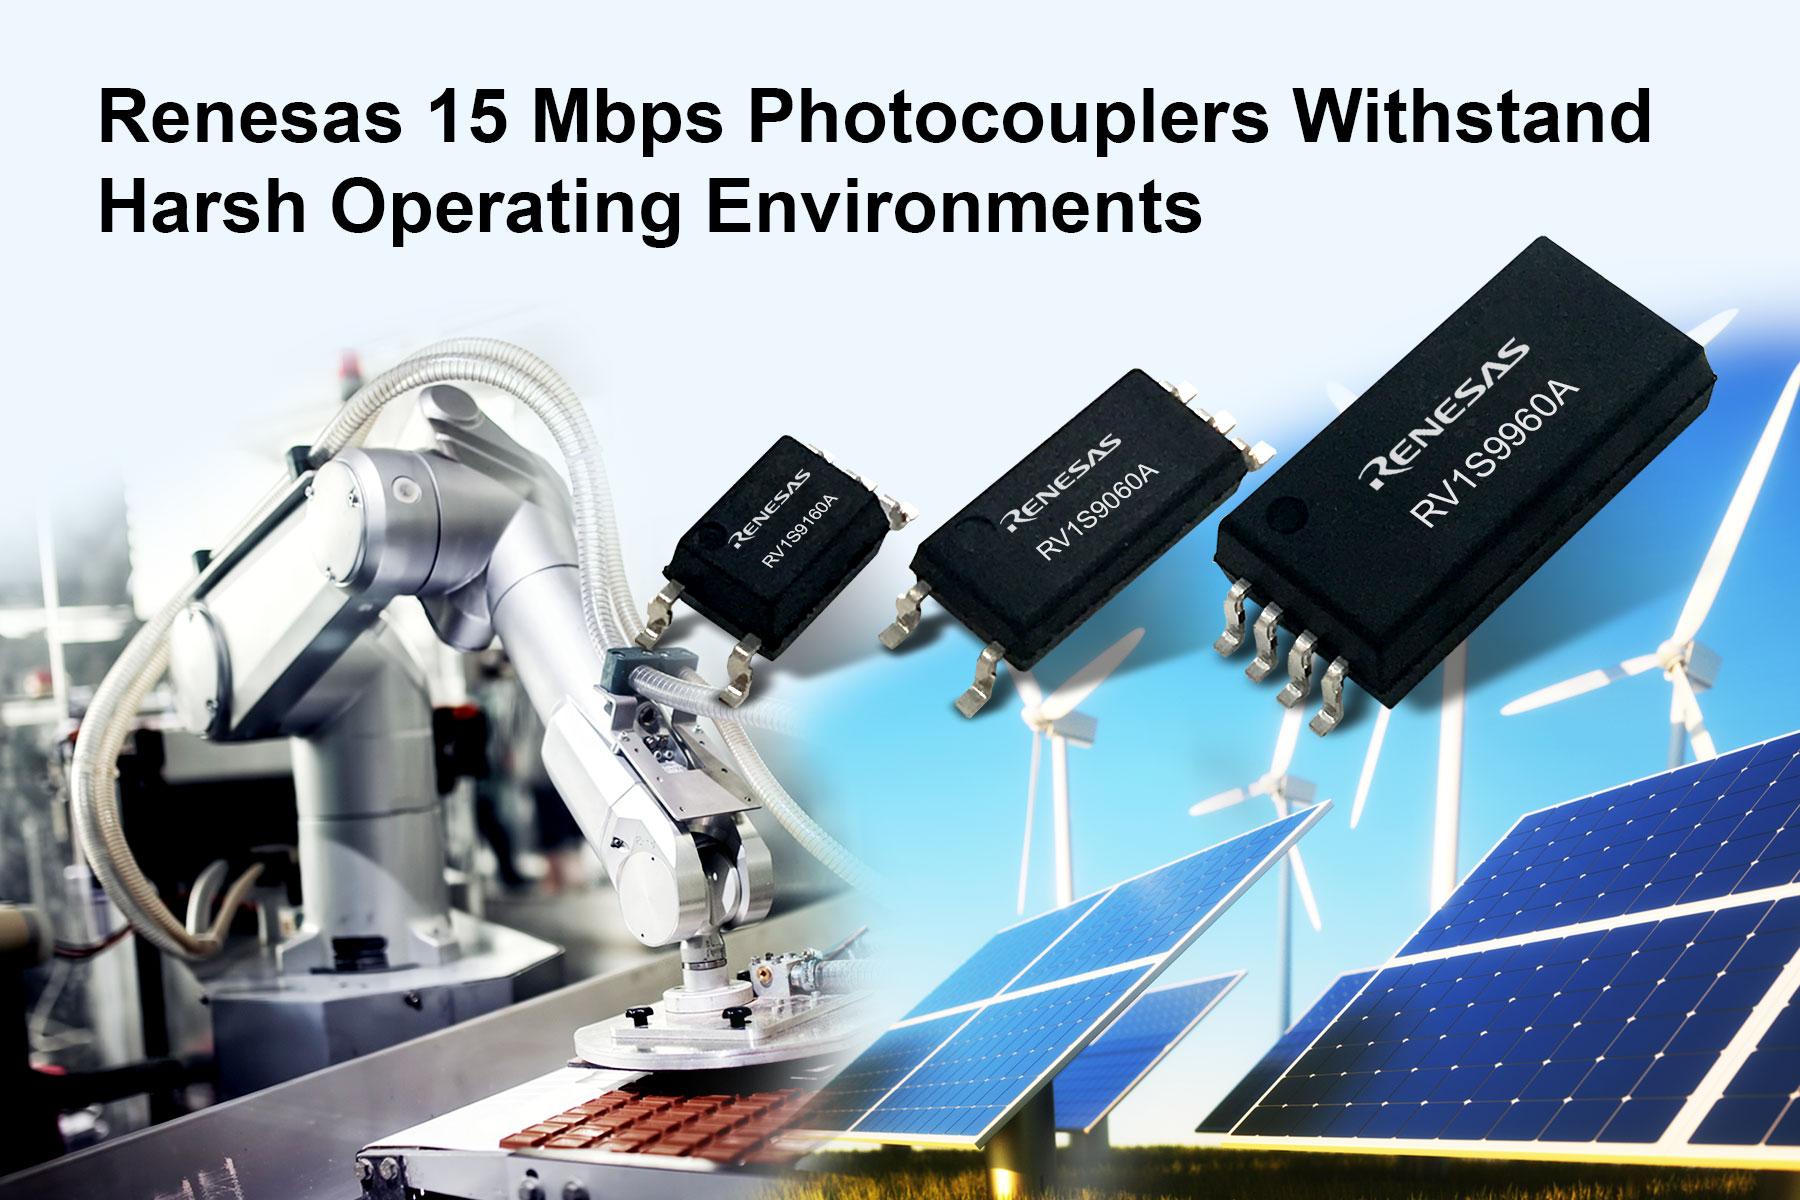 RV1S9160A-9060A-9960A-15Mbps-Photocouplers-pressphoto.jpg